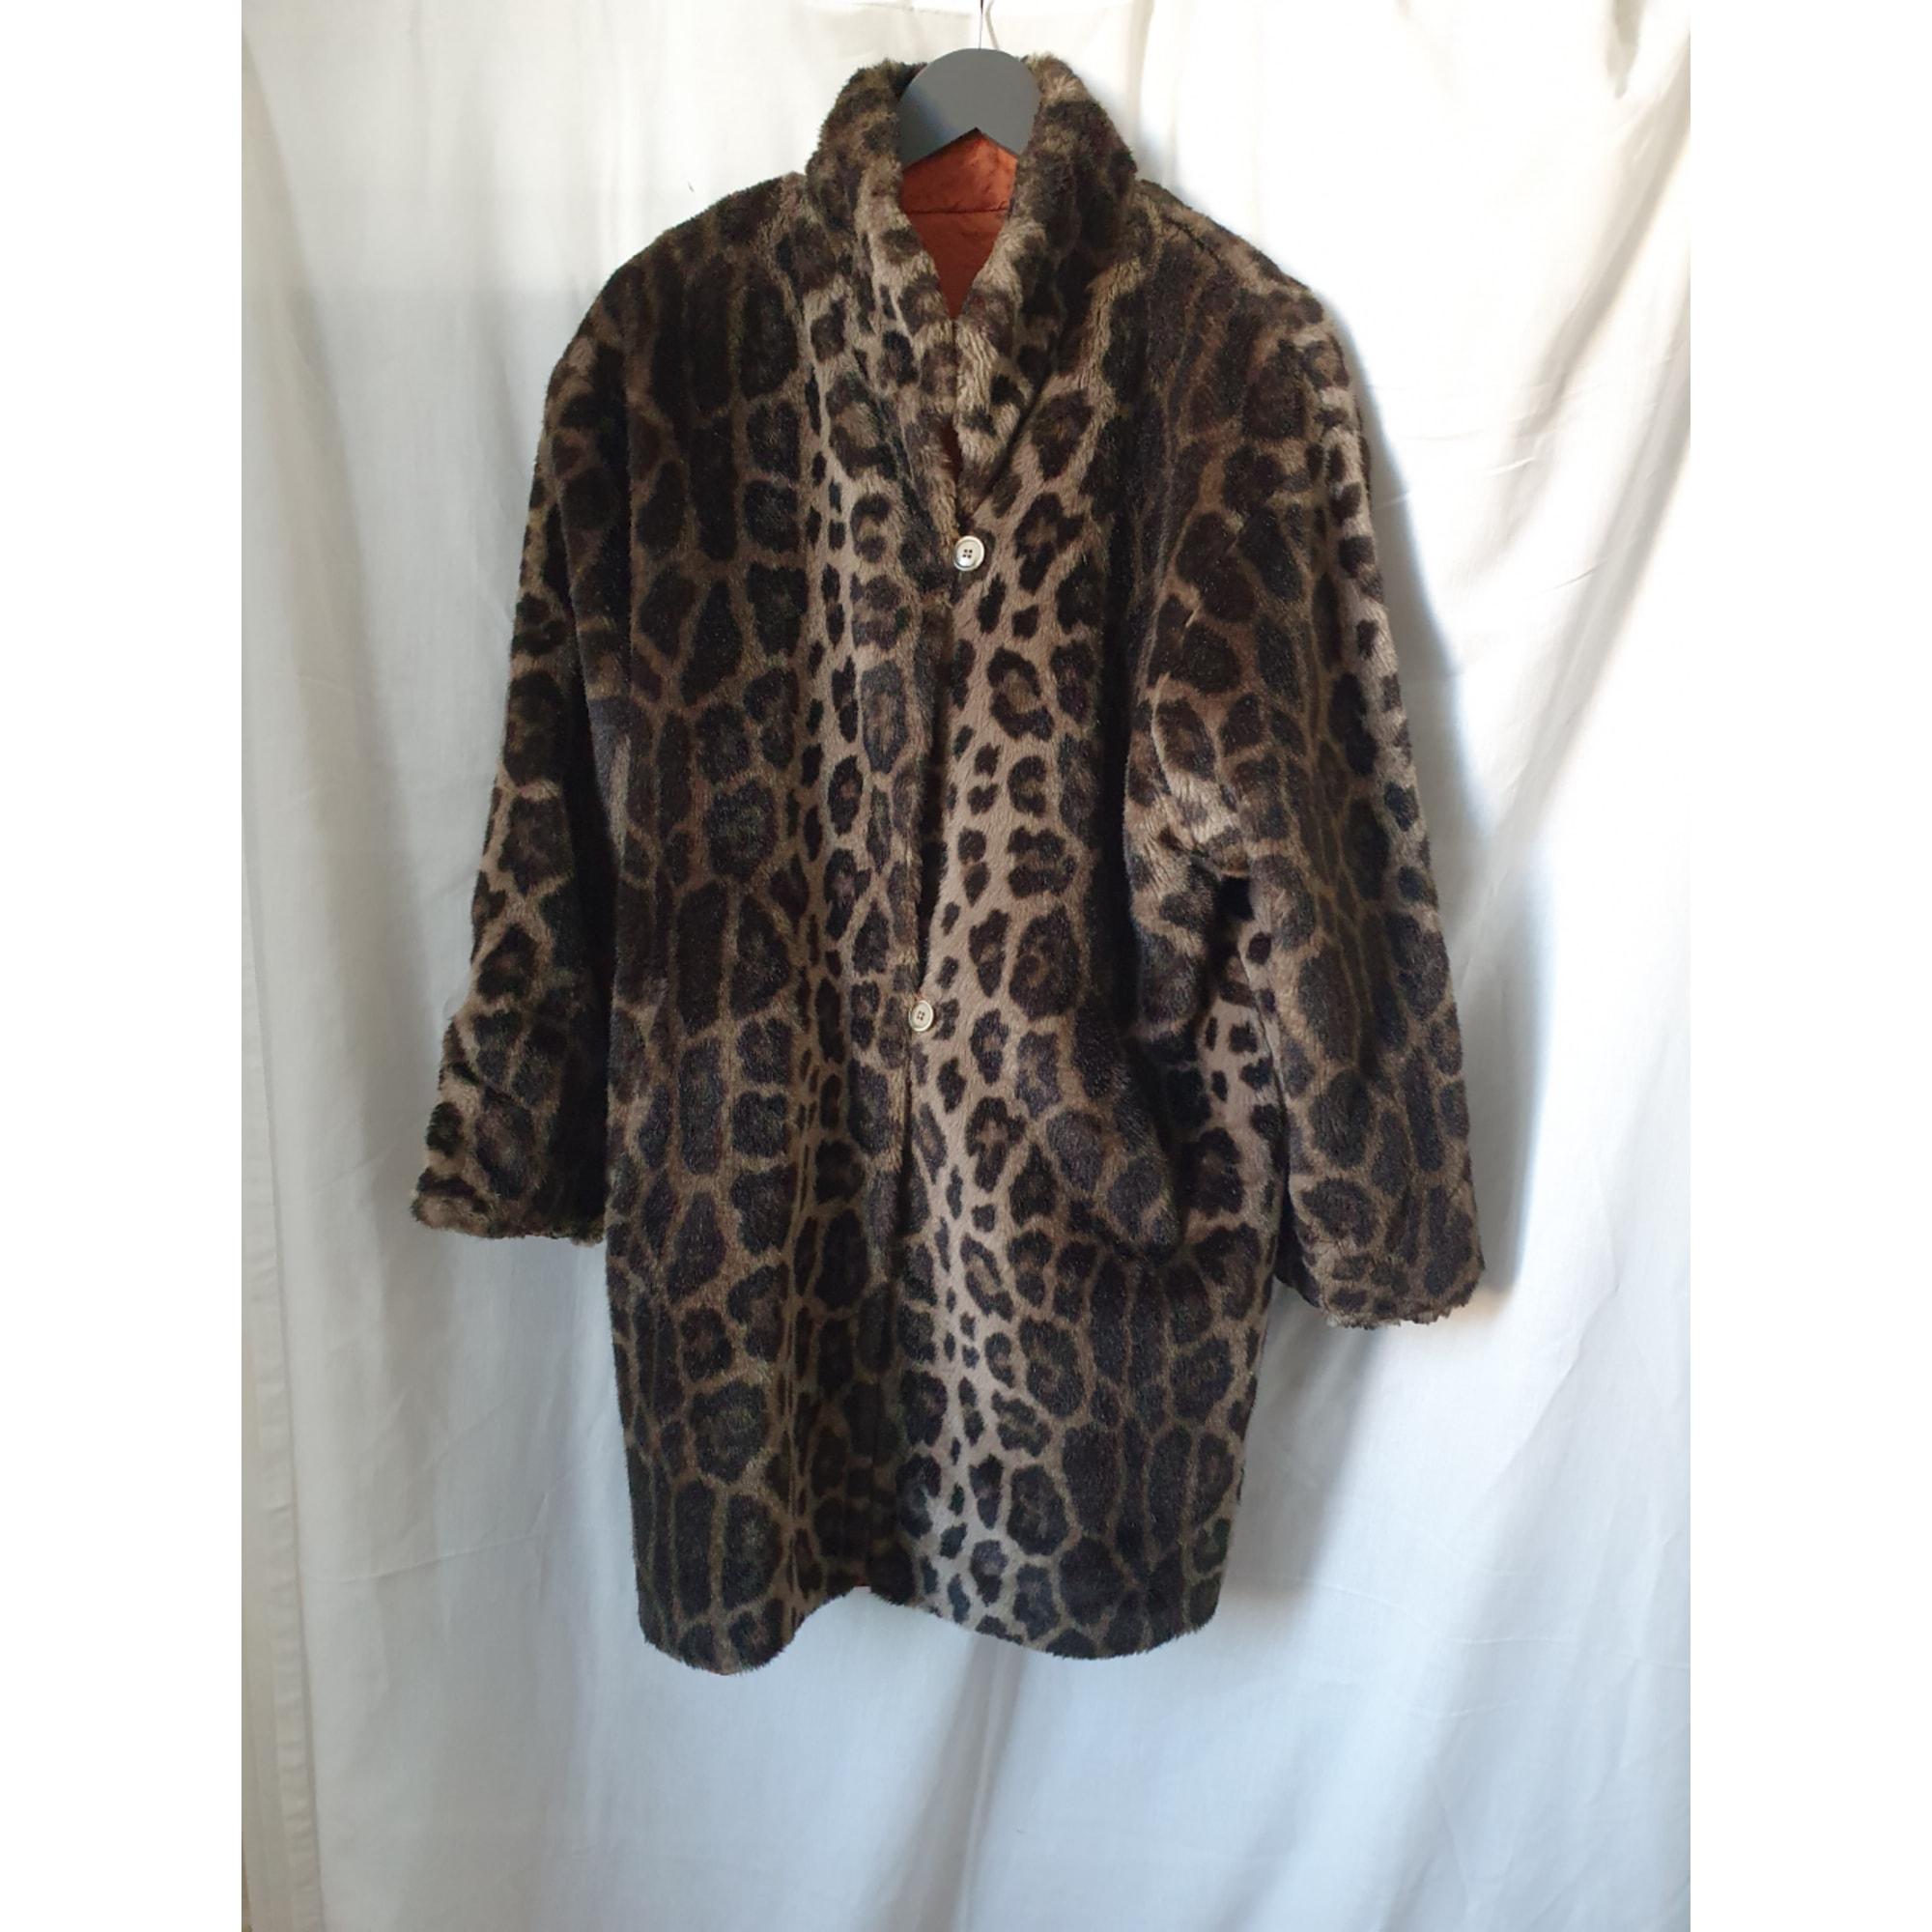 Manteau en fourrure NORBERT NELL Imprimés animaliers